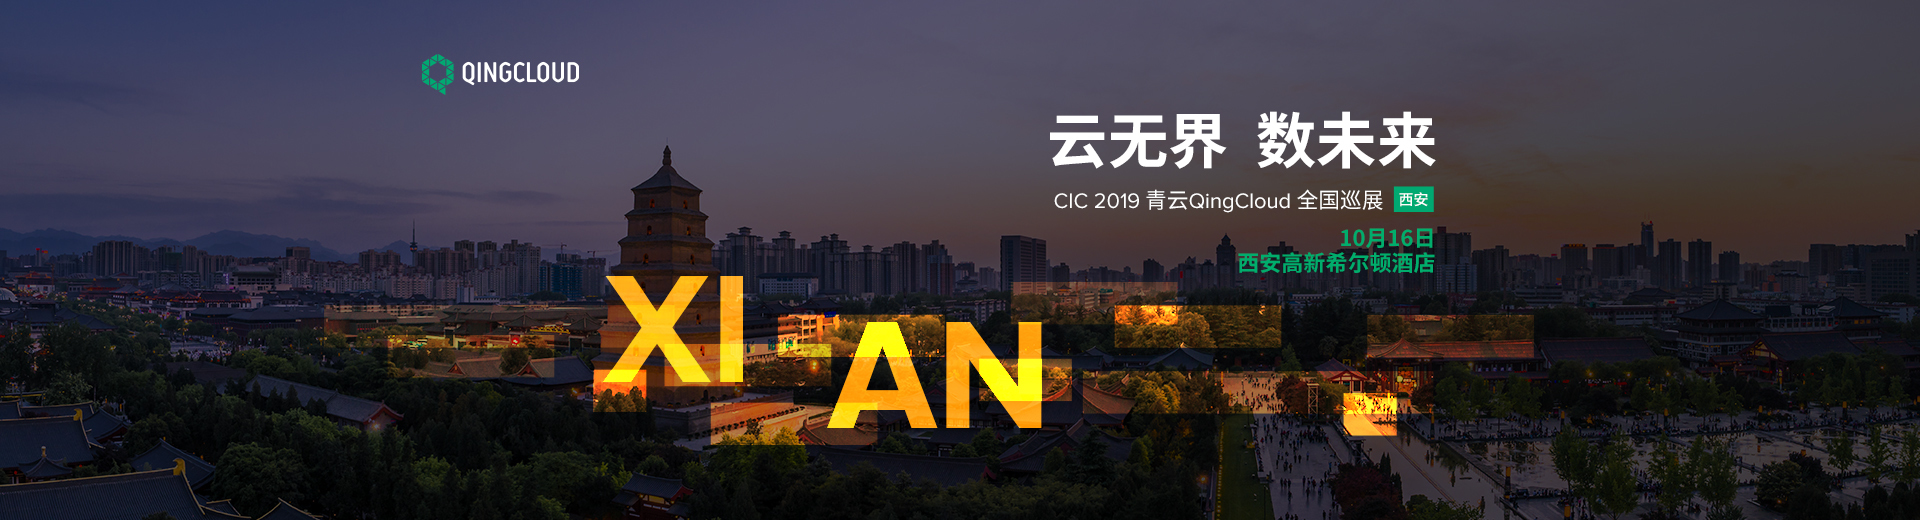 西安站 — CIC 2019 青云QingCloud 全国巡展